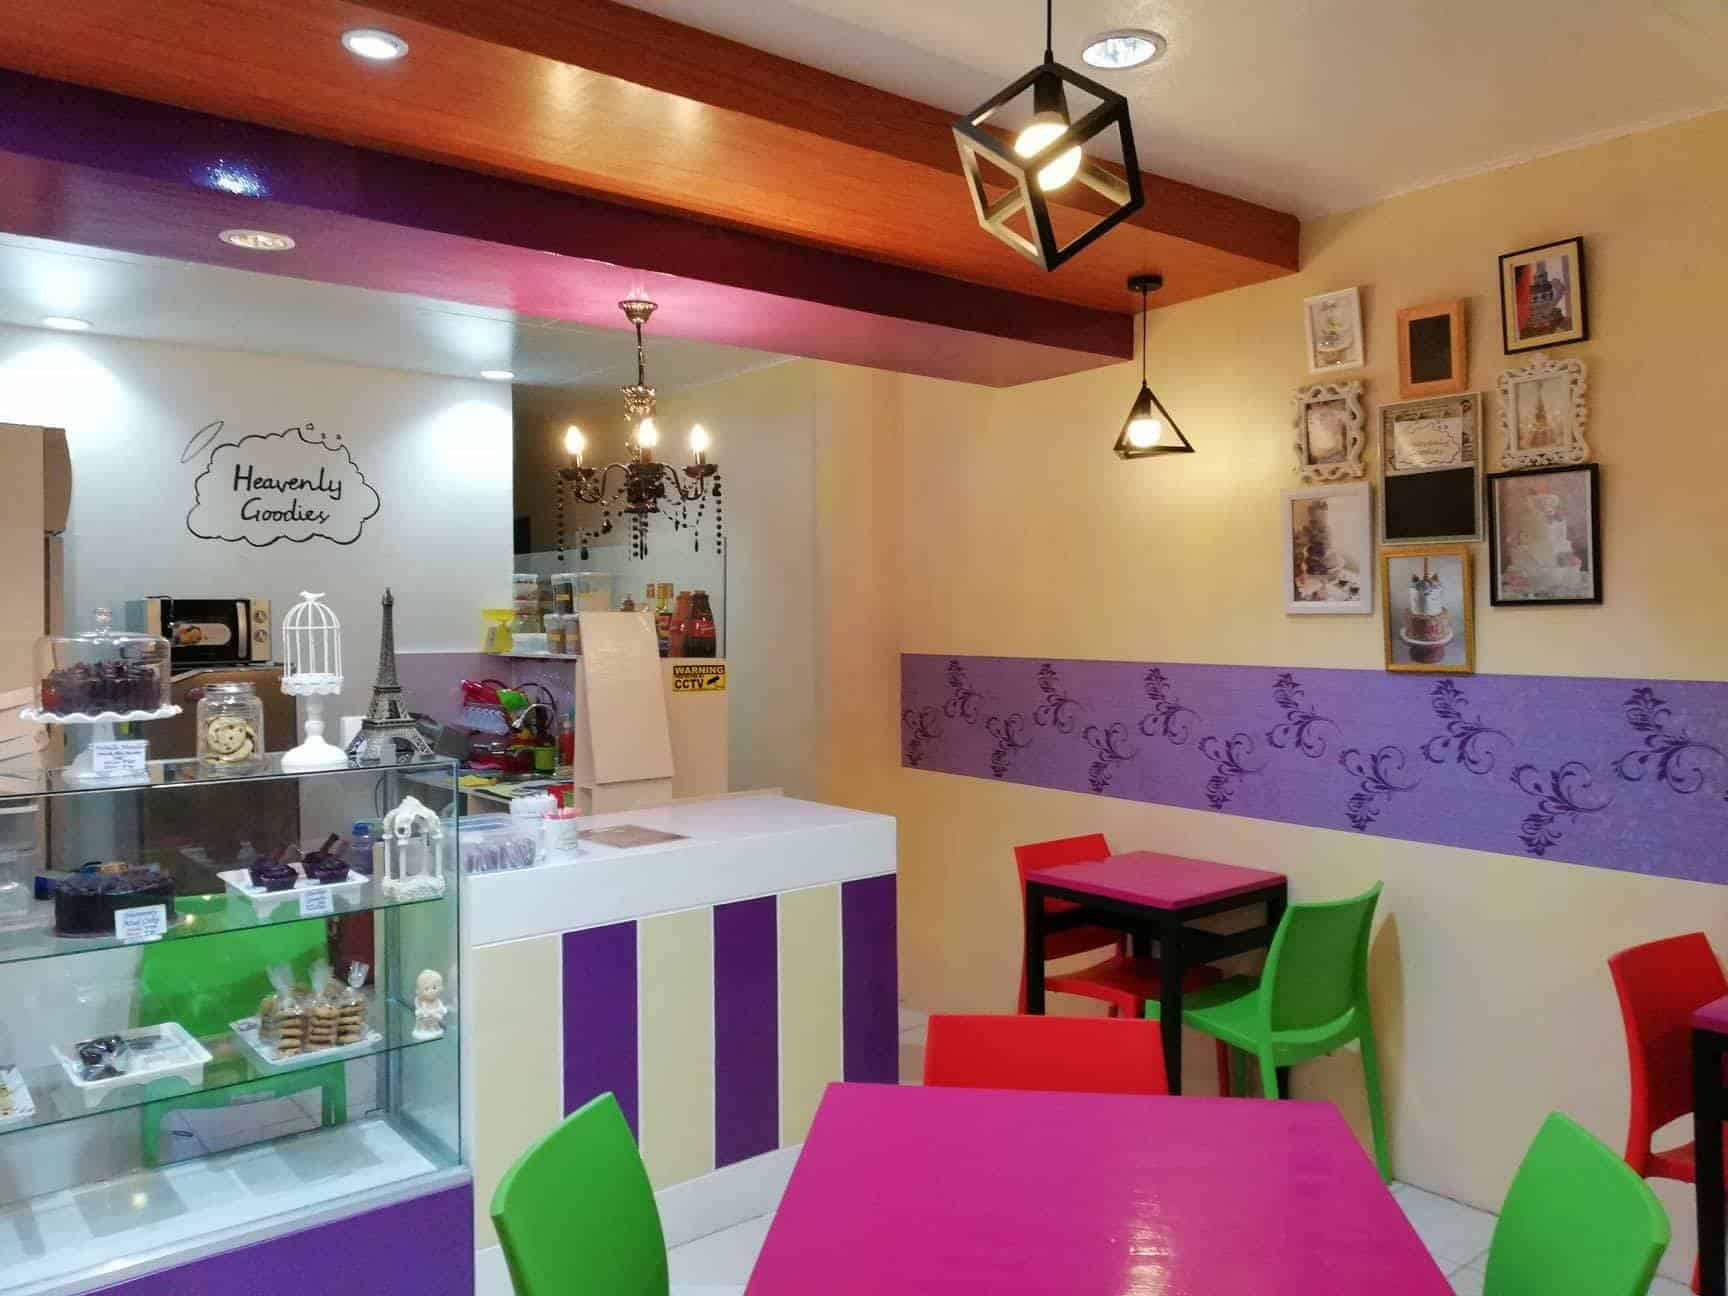 heavenly goodies and pastries cebu (3)